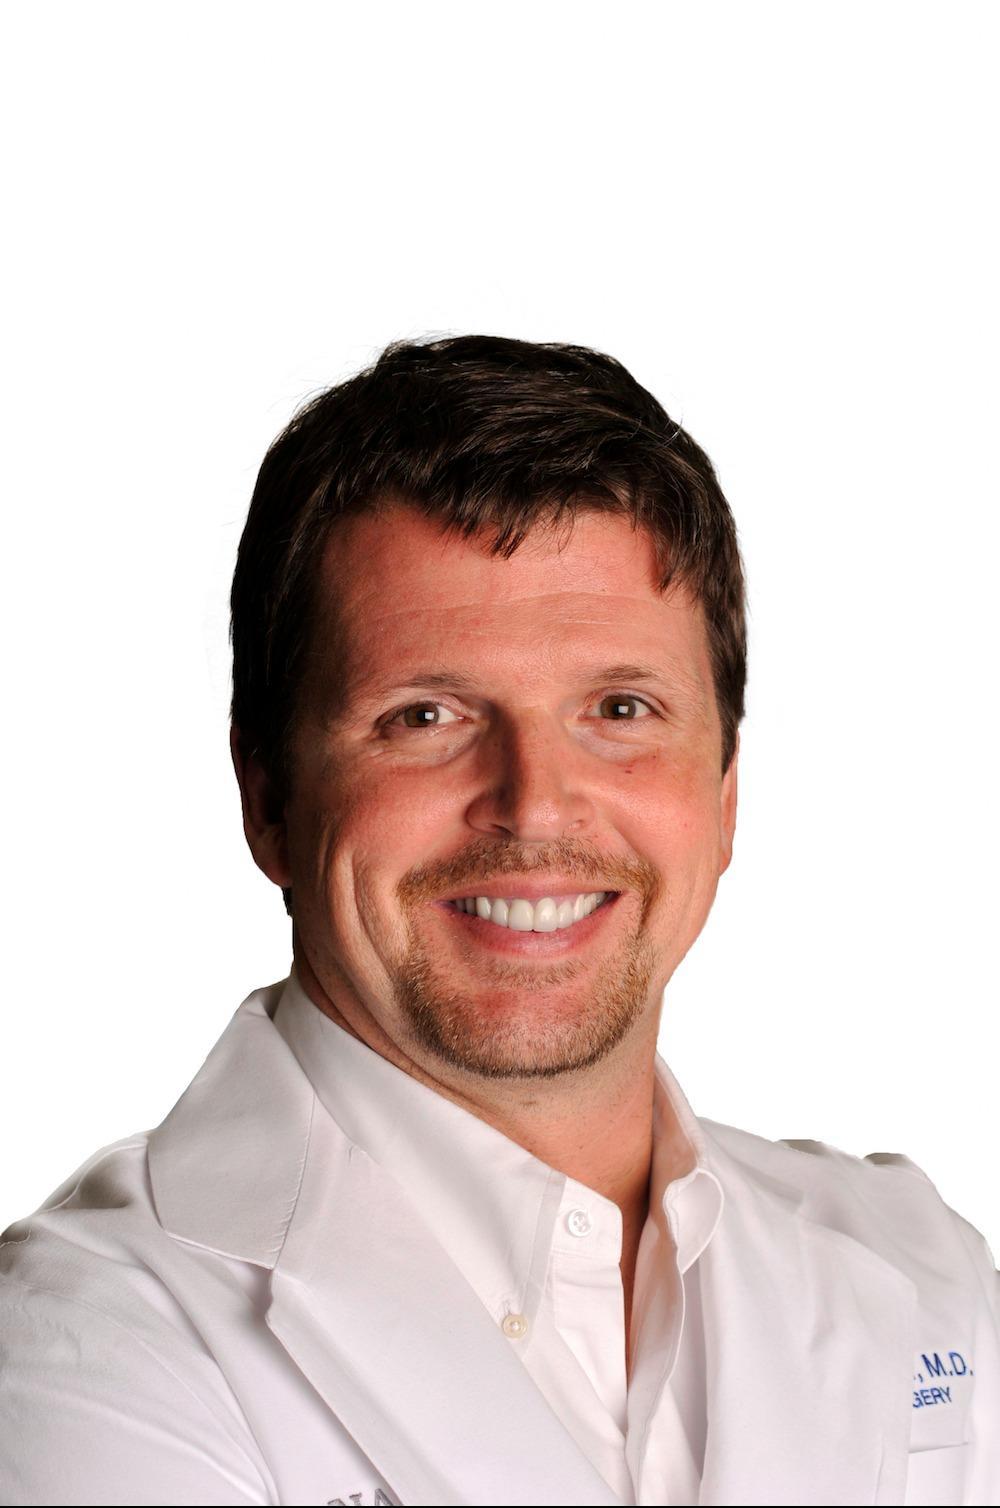 Brotzman Sports Medicine: Brent S. Brotzman, MD